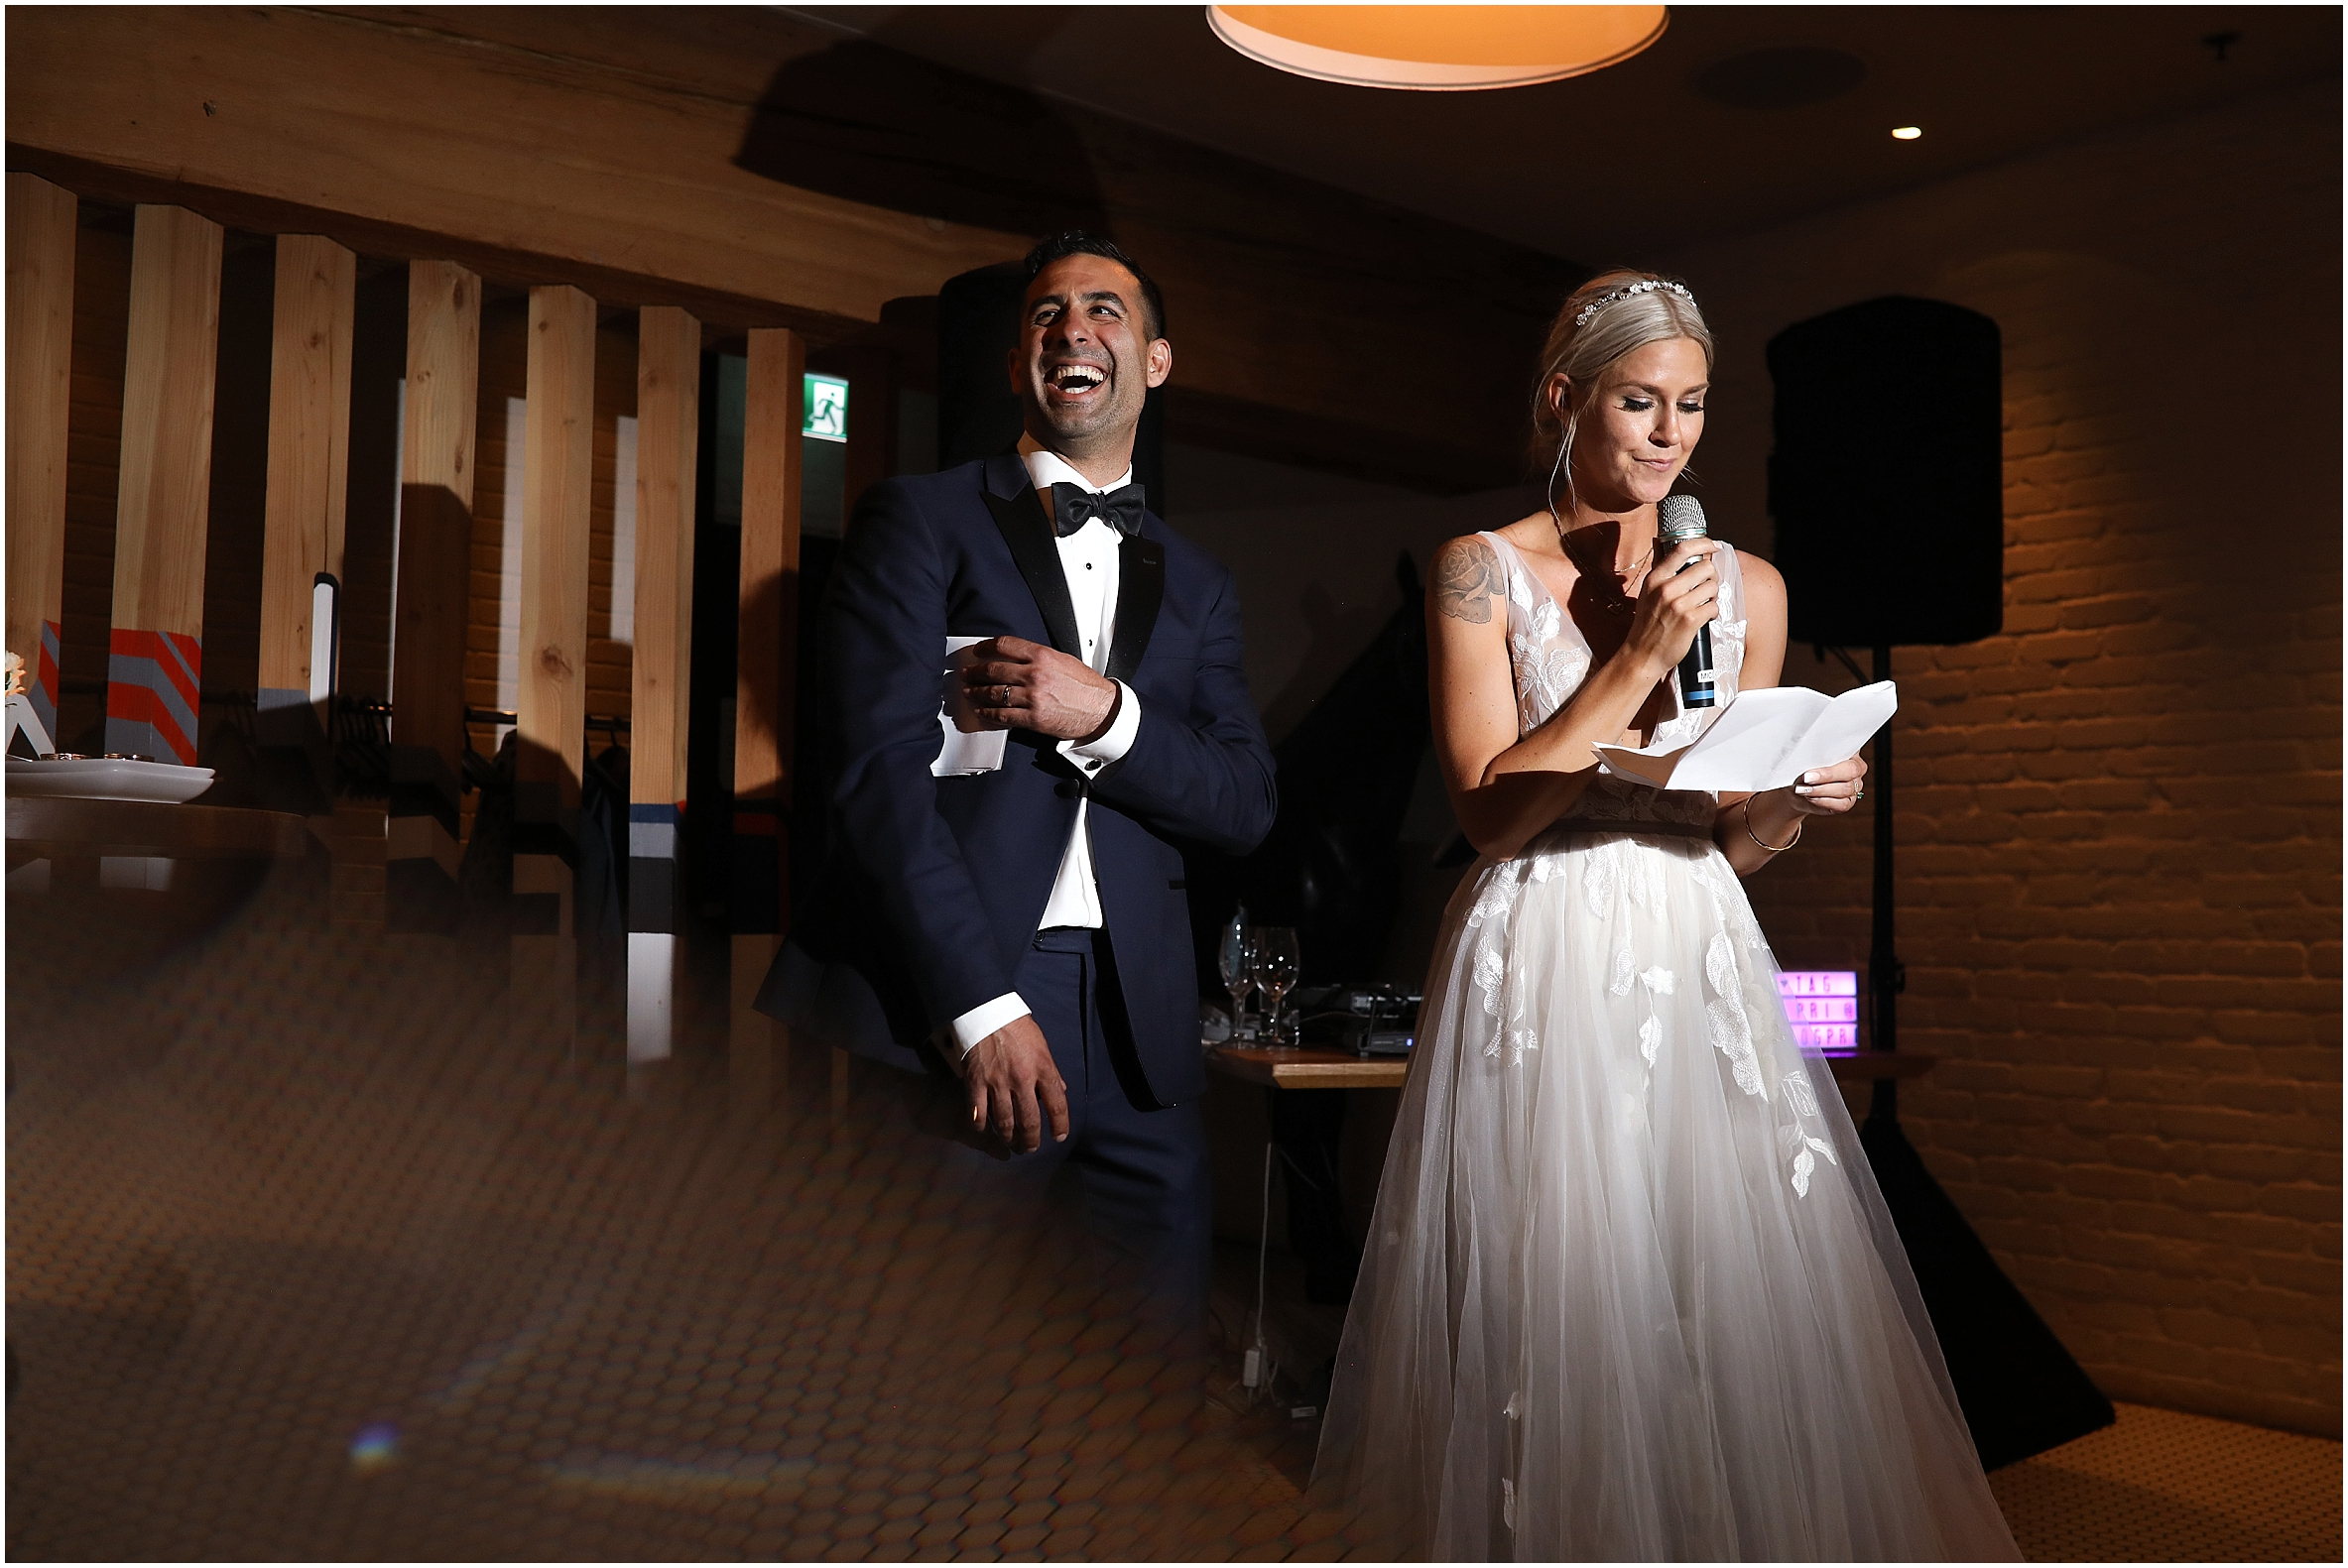 vancouver-wedding-photographer-the-loft-earls-yaletown_0029.jpg